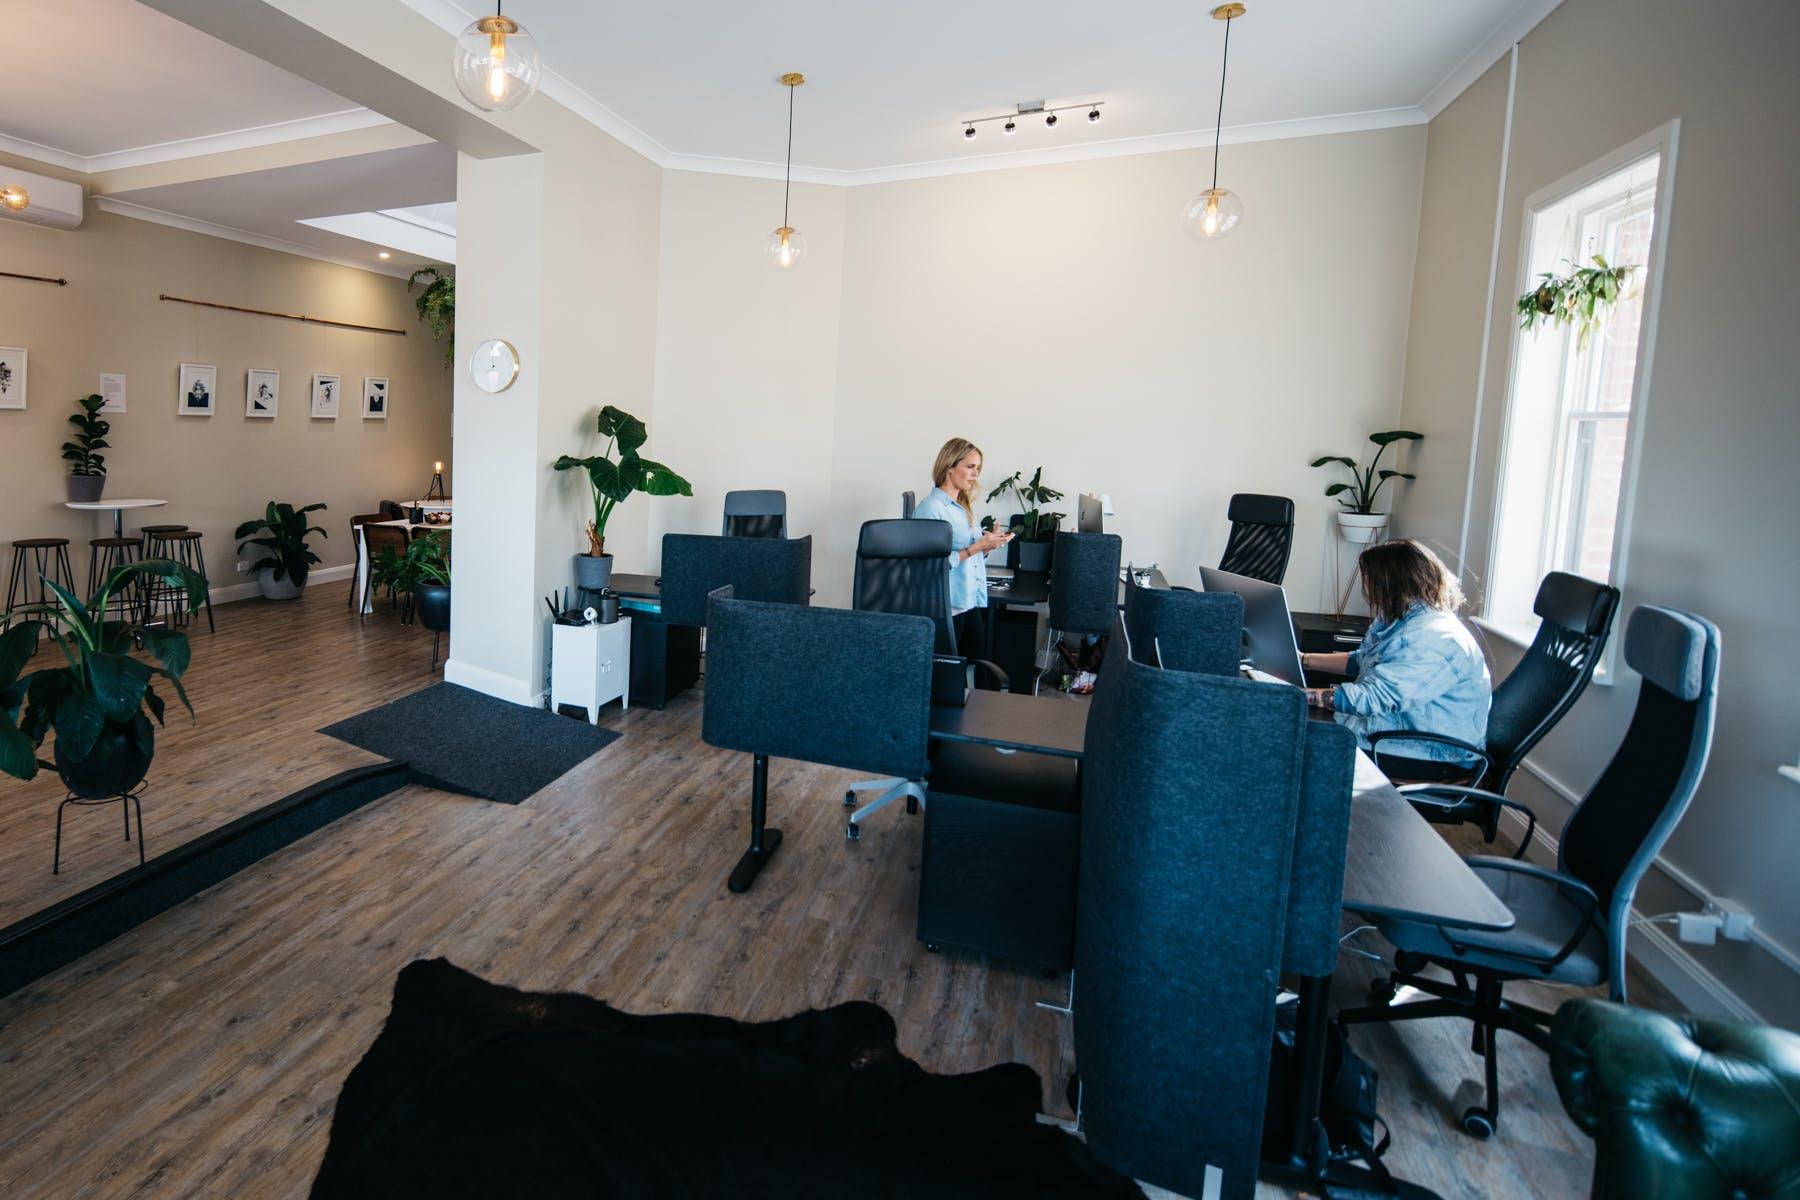 Hot desk at Lightbox Co-Working, image 1